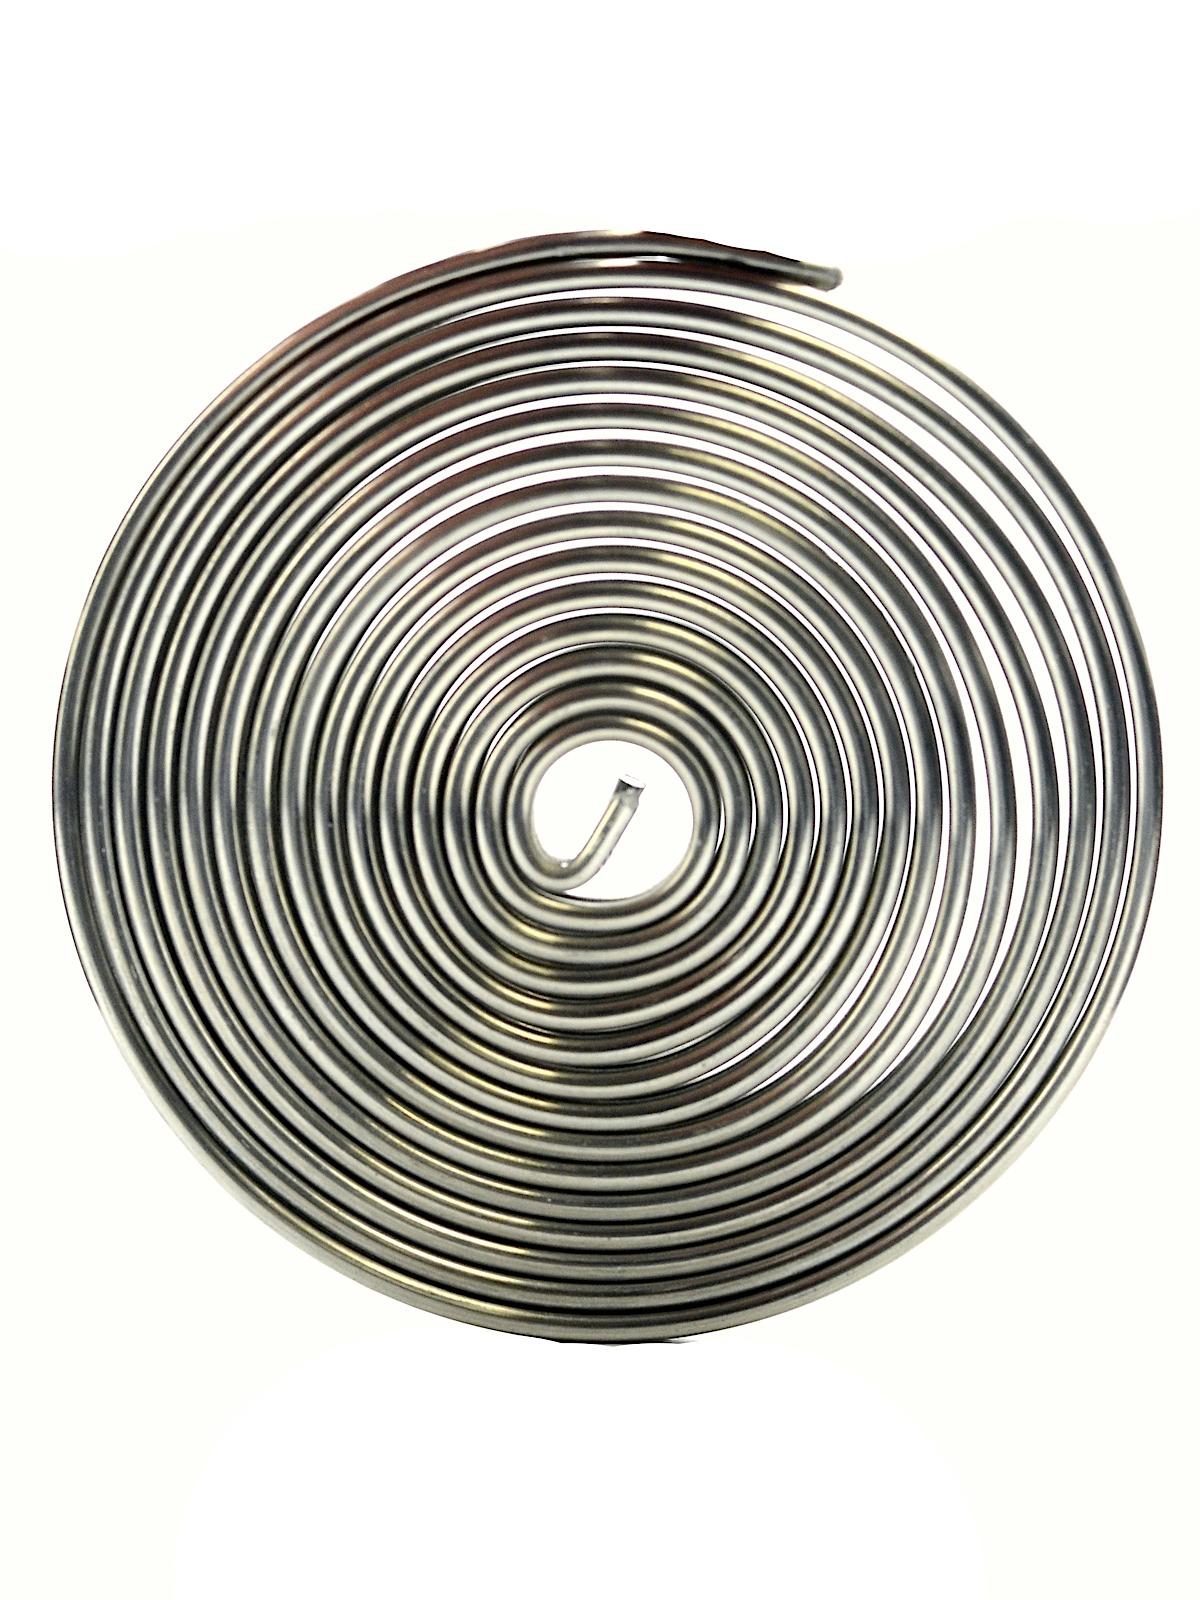 Jack Richeson Armature Wire | MisterArt.com